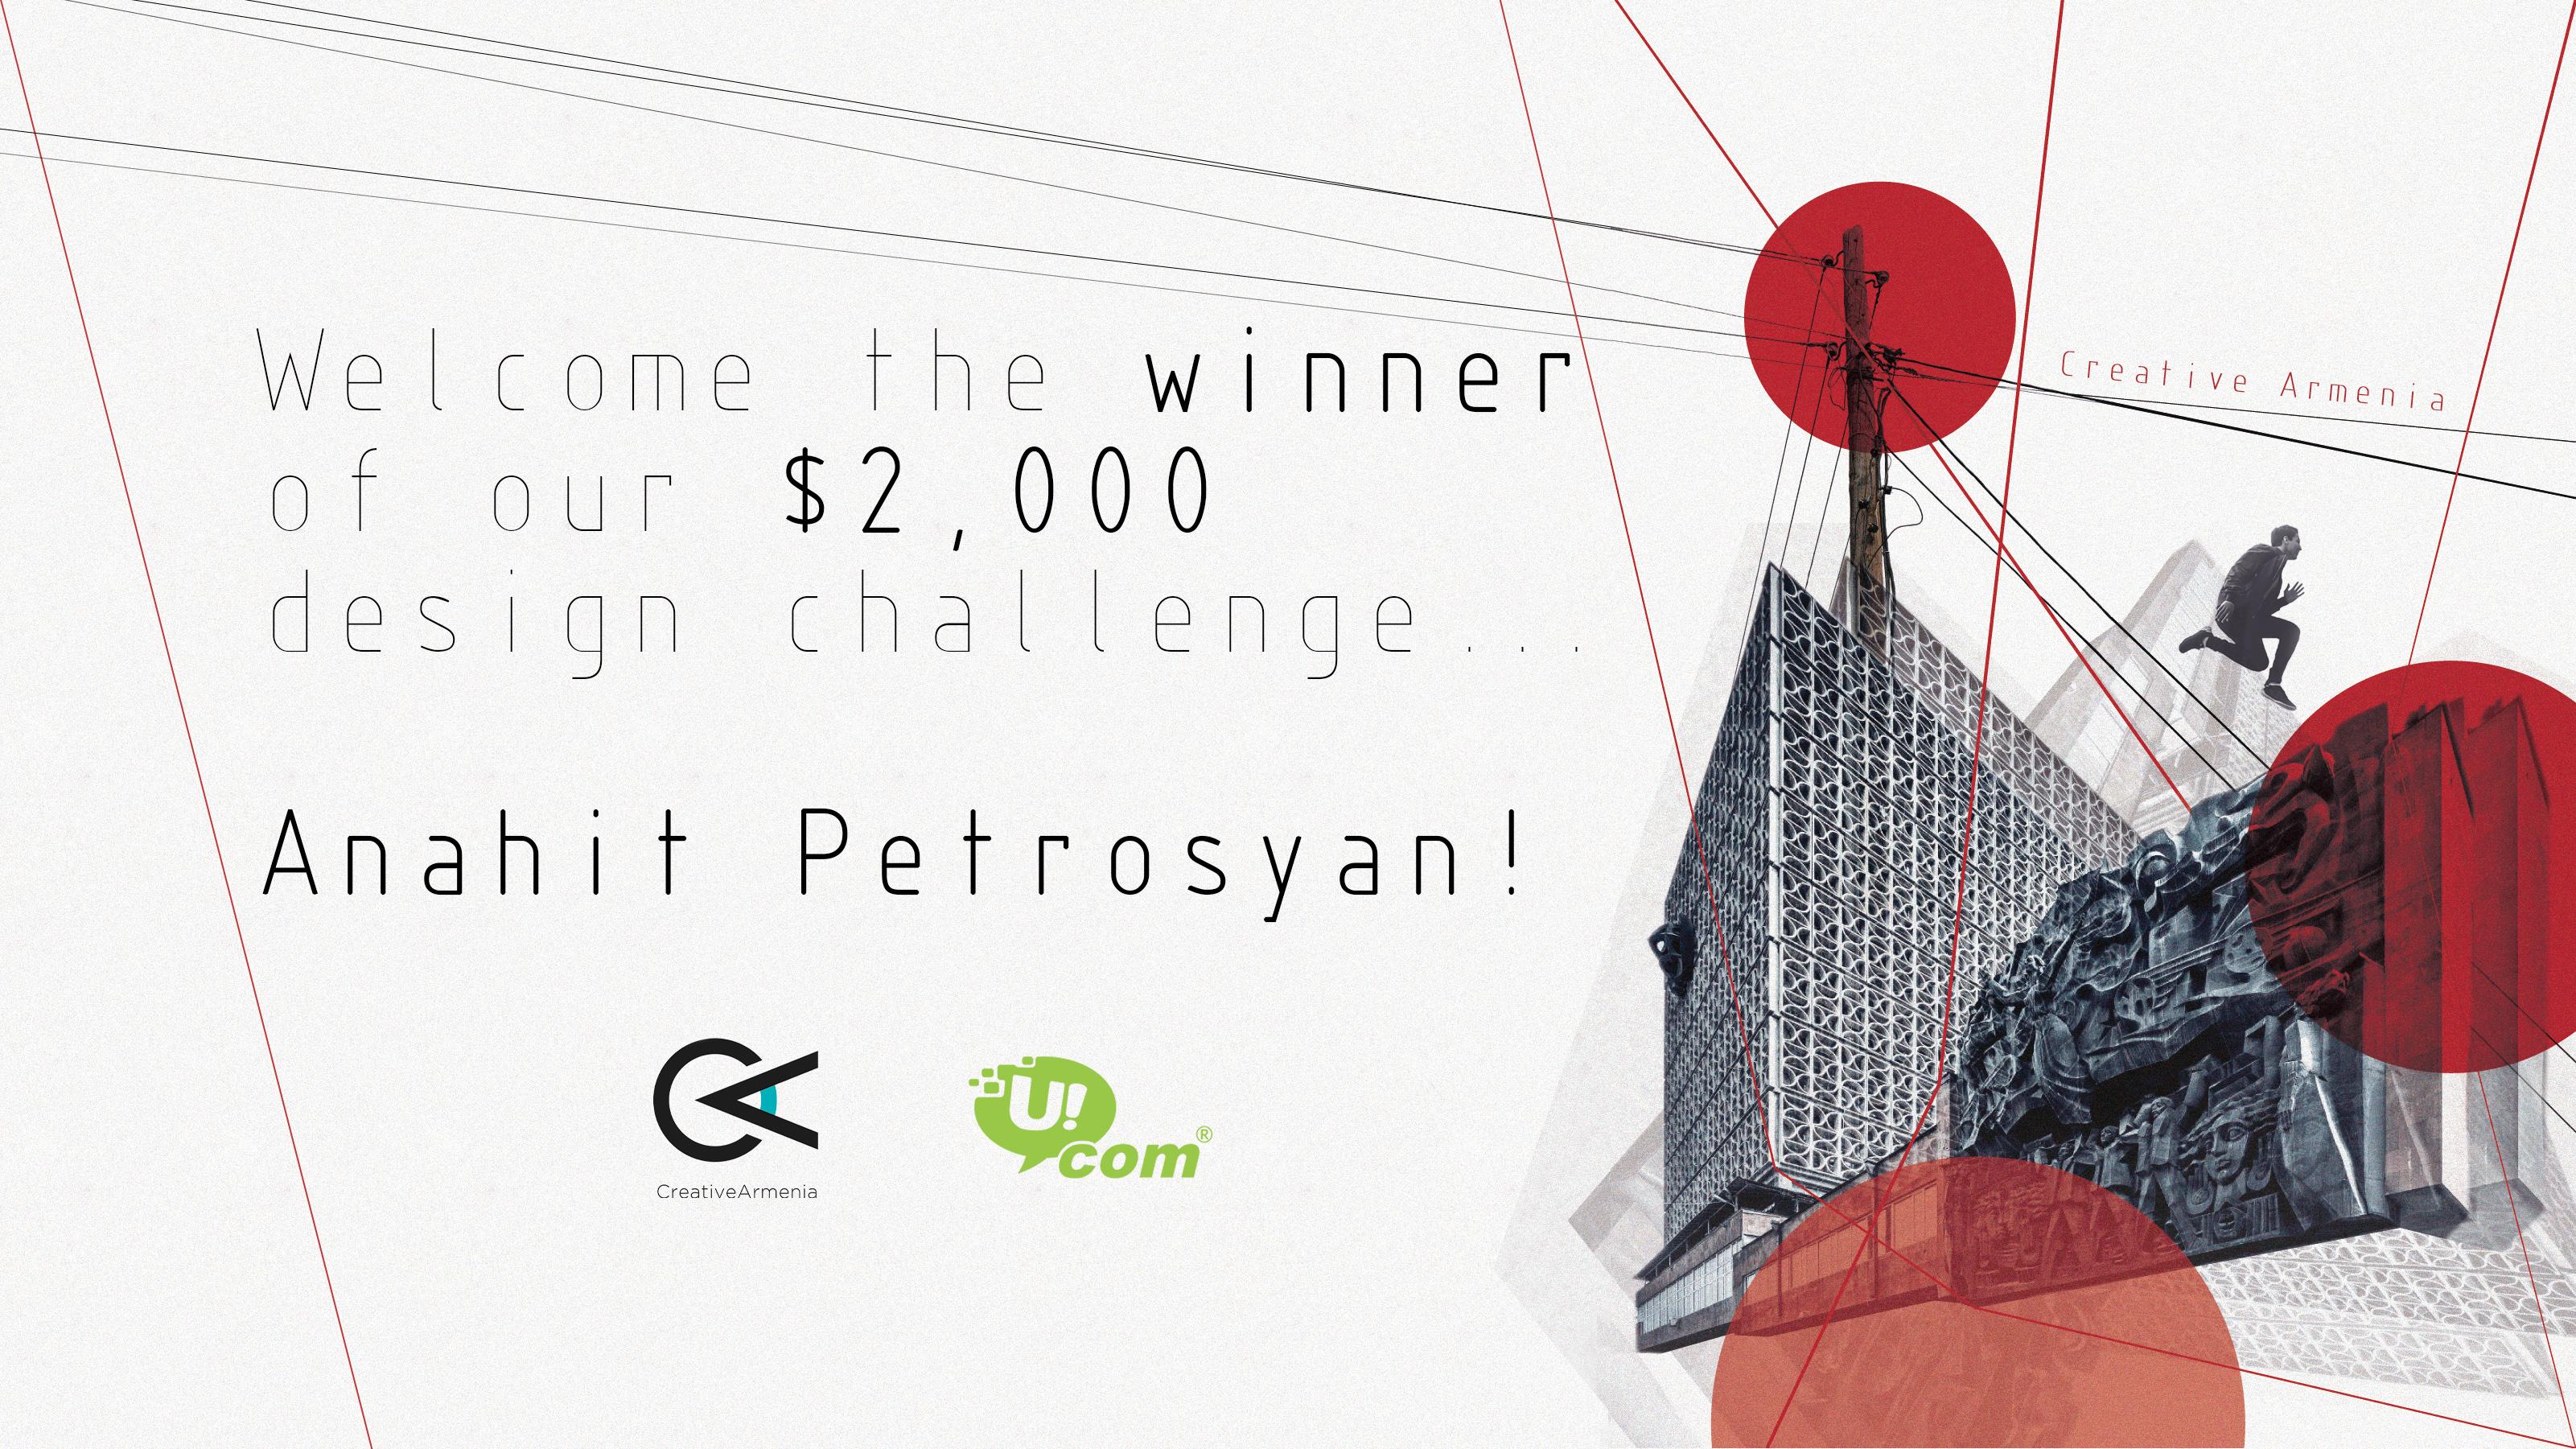 Creative Armenia-ն և Ucom-ը հայտարարում են 2,000 ԱՄՆ դոլար մրցանակի արժանացած «Ֆիլմի պաստառ» դիզայնի մարտահրավերի հաղթողին